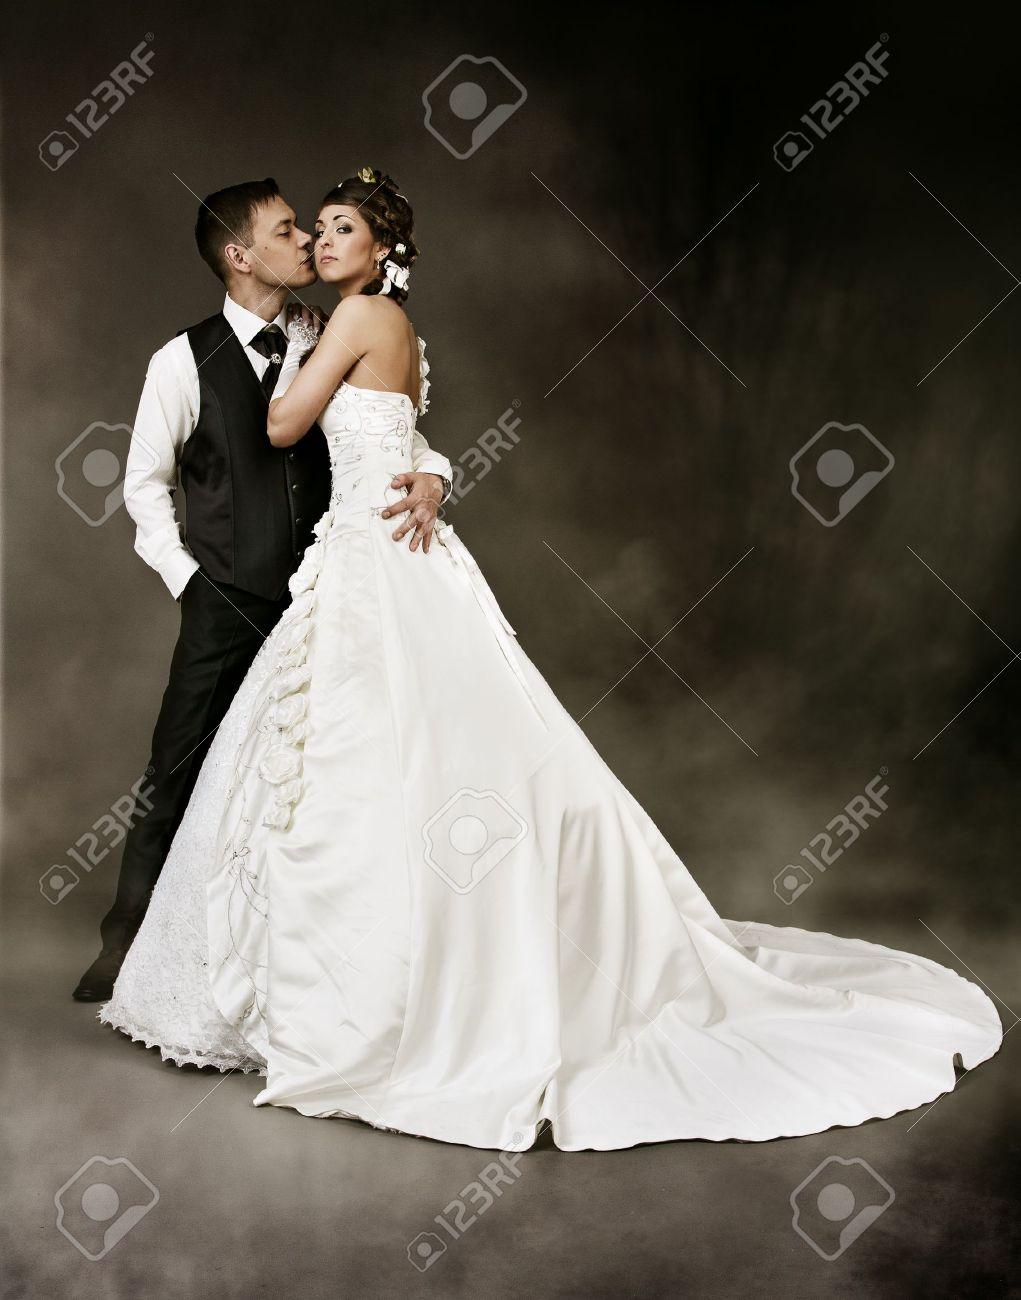 Wedding Couple Fashion Shoot